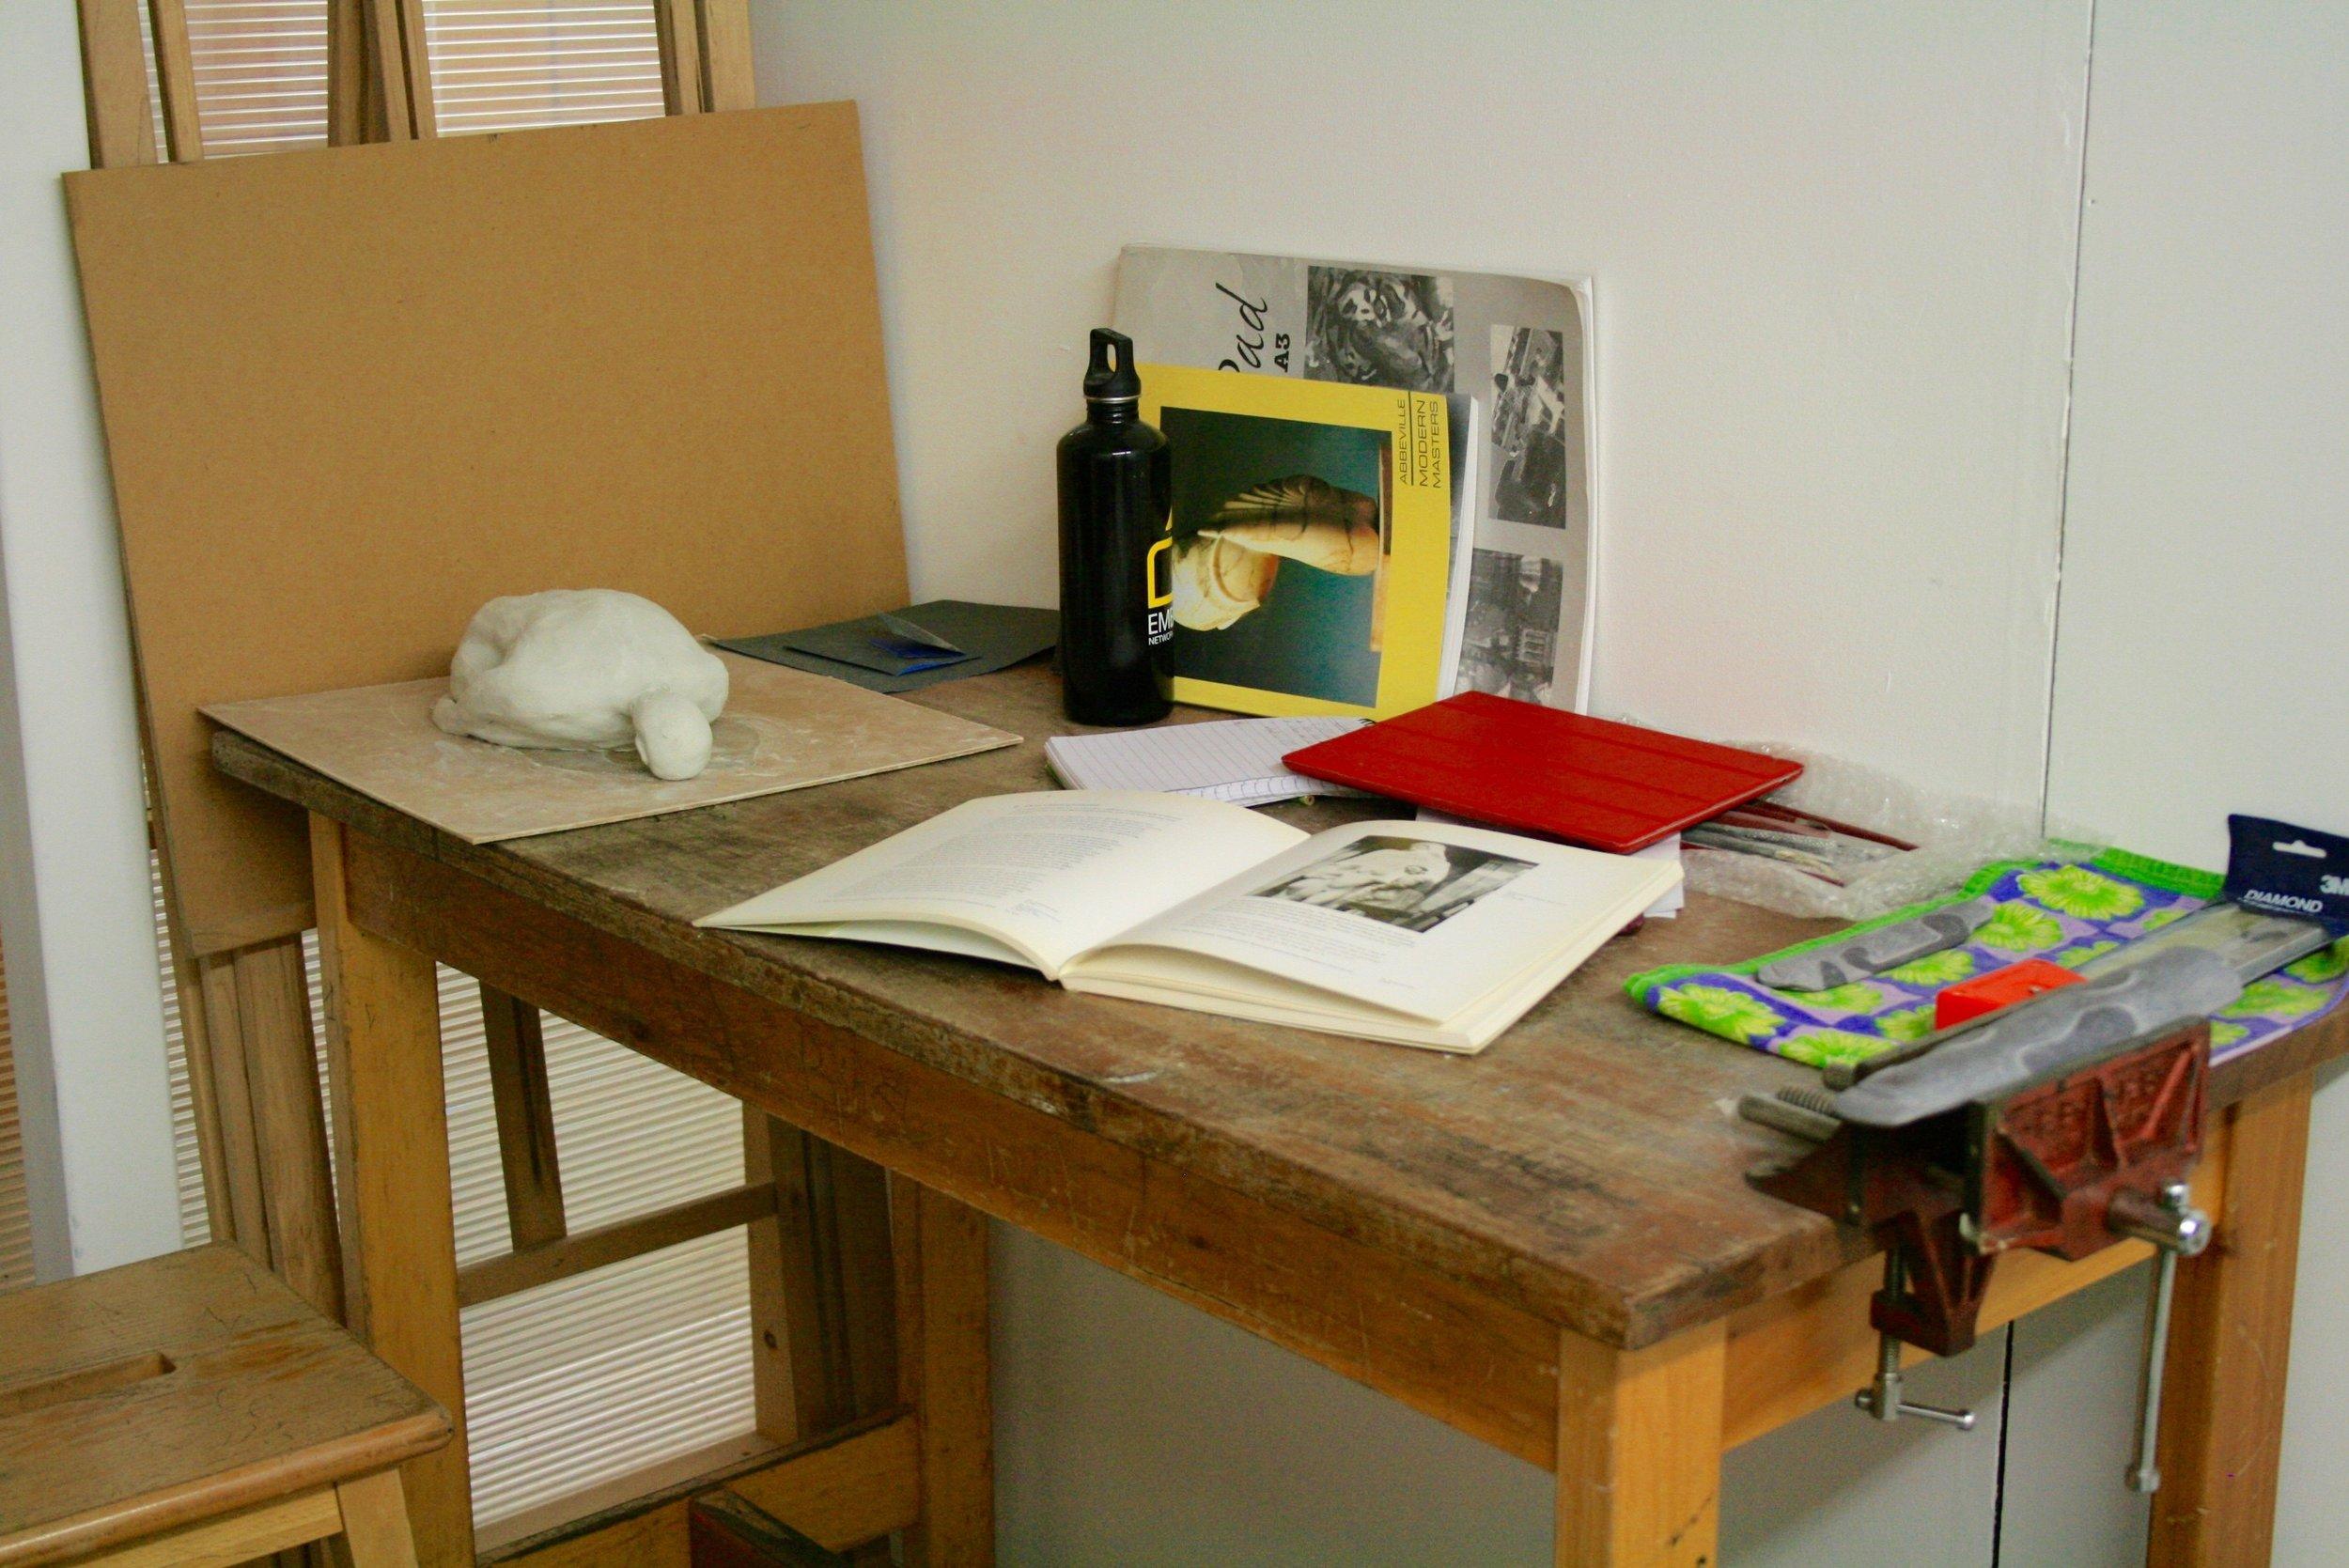 Judith Pollock's Workspace at Hotel Elephant